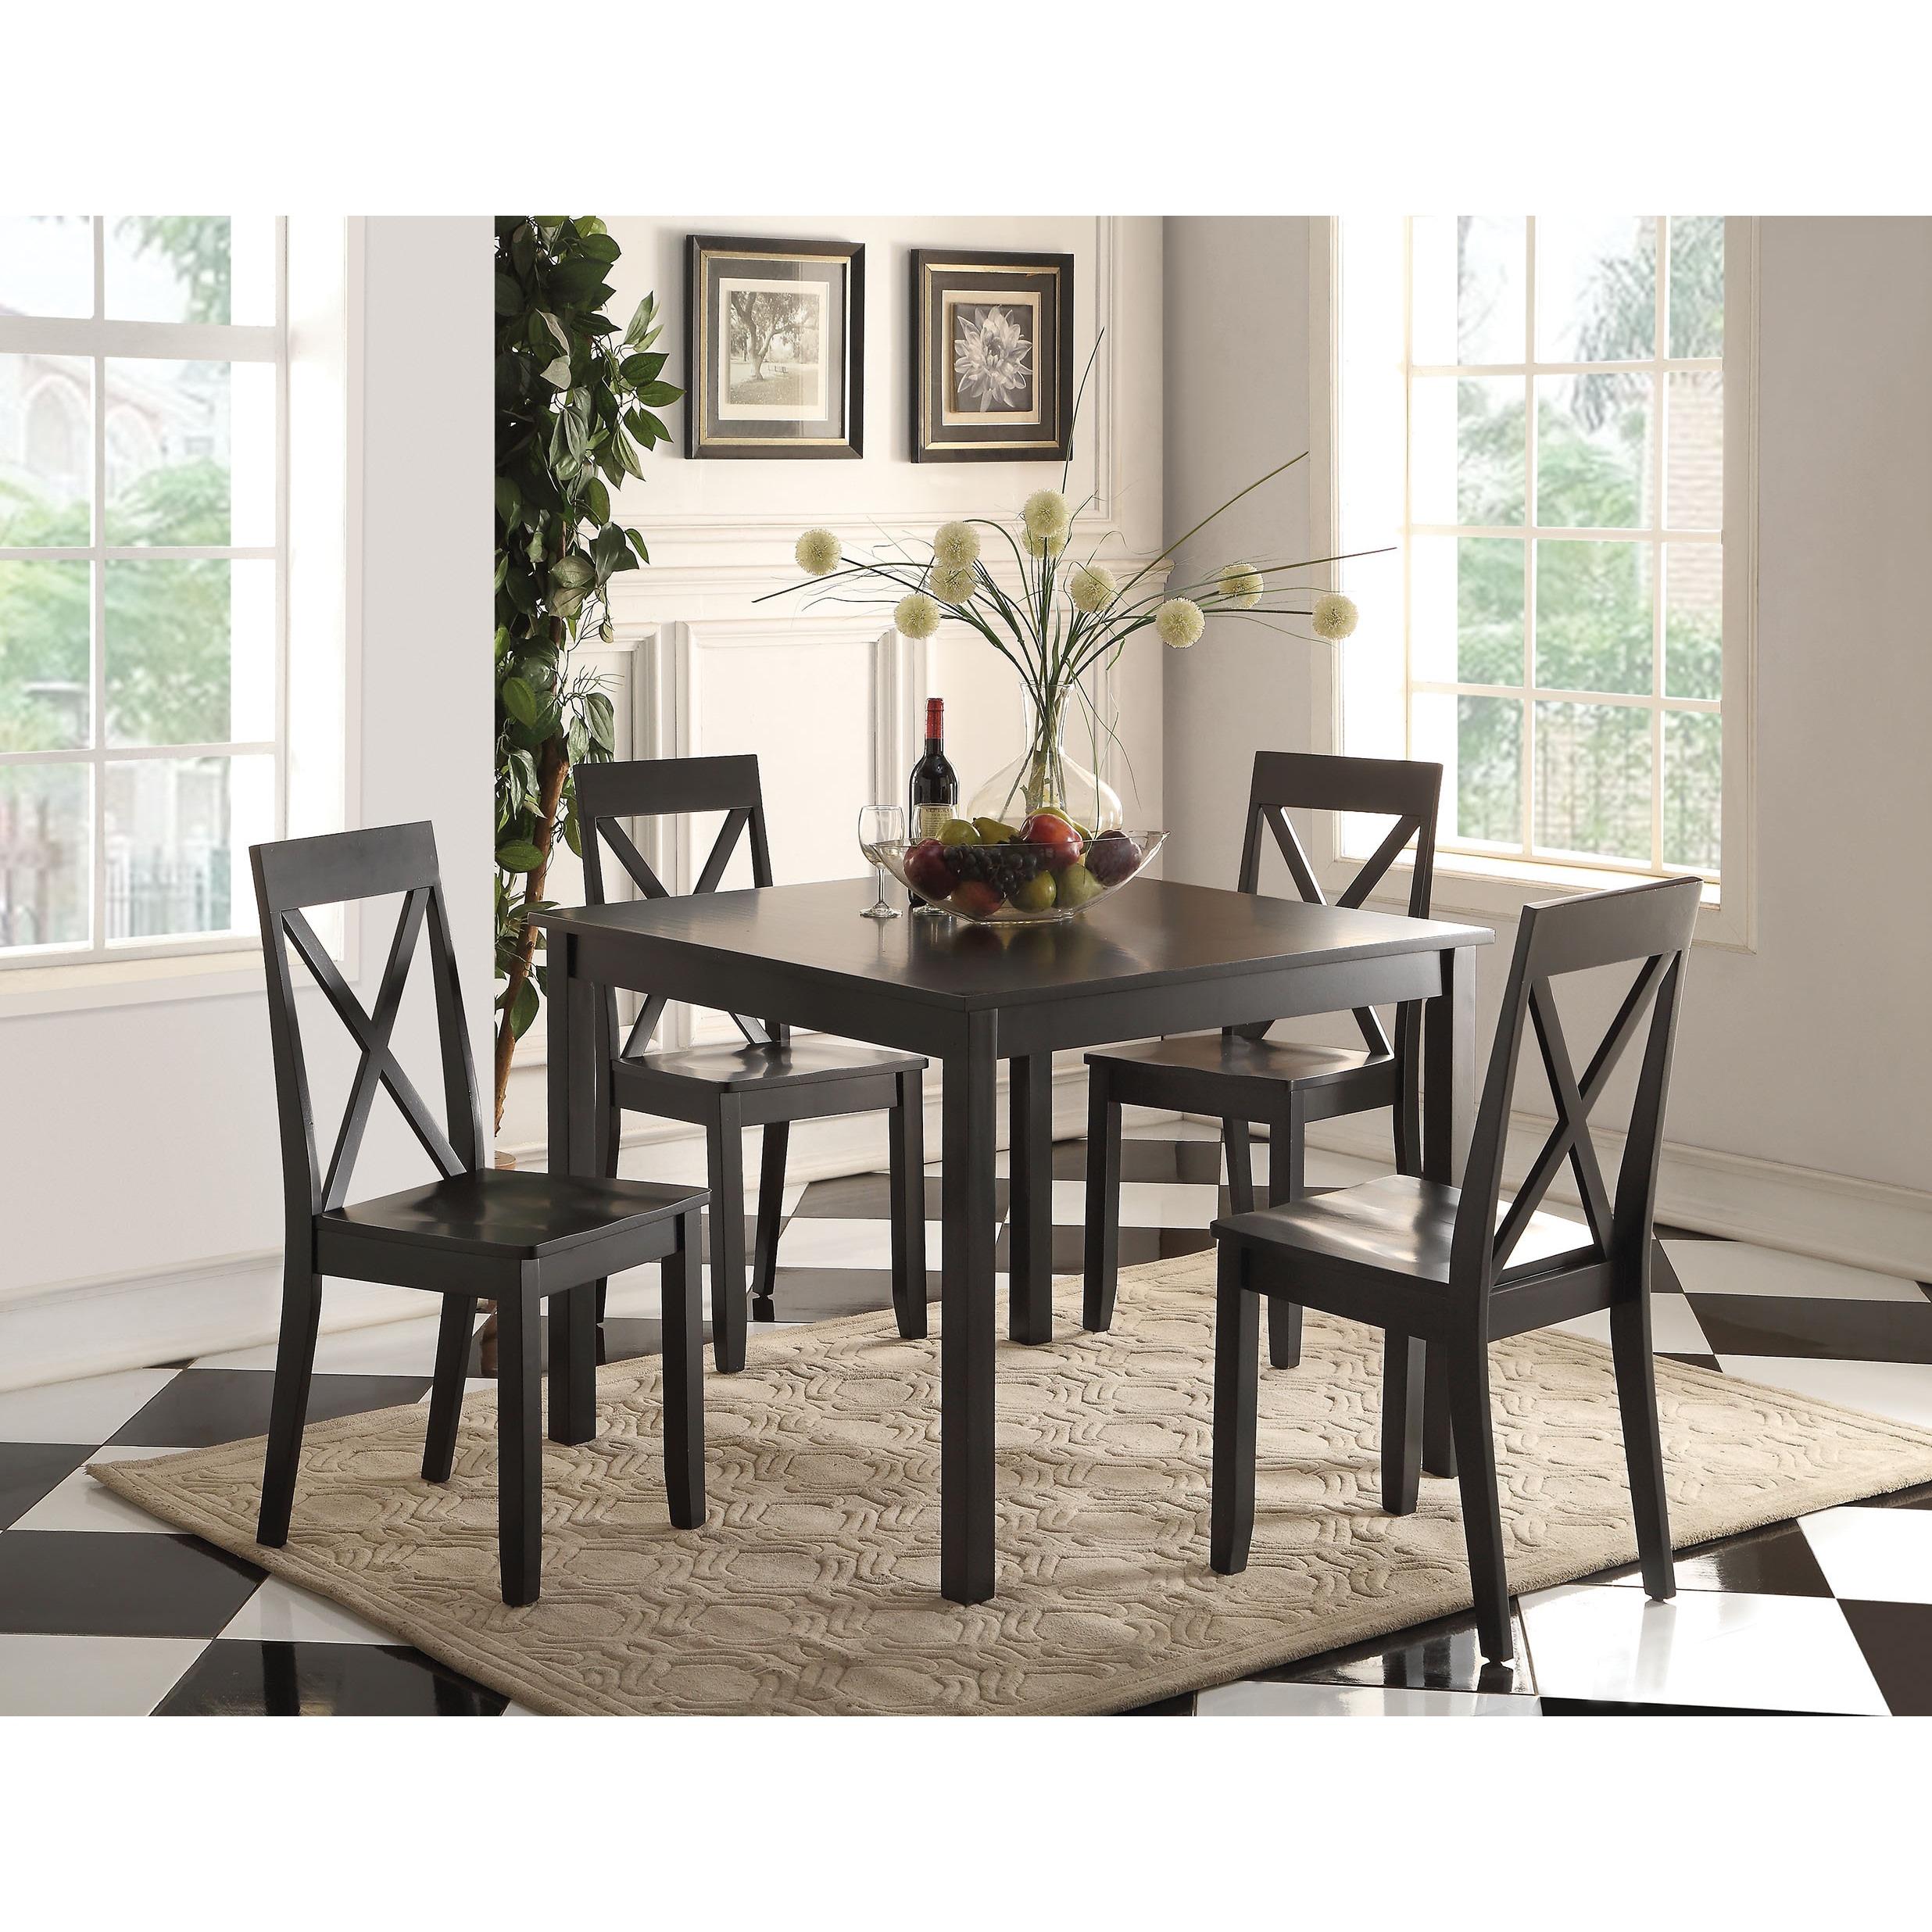 "ACME Zlipury Black Wood 5-piece Dining Set (Black, 39""L x..."